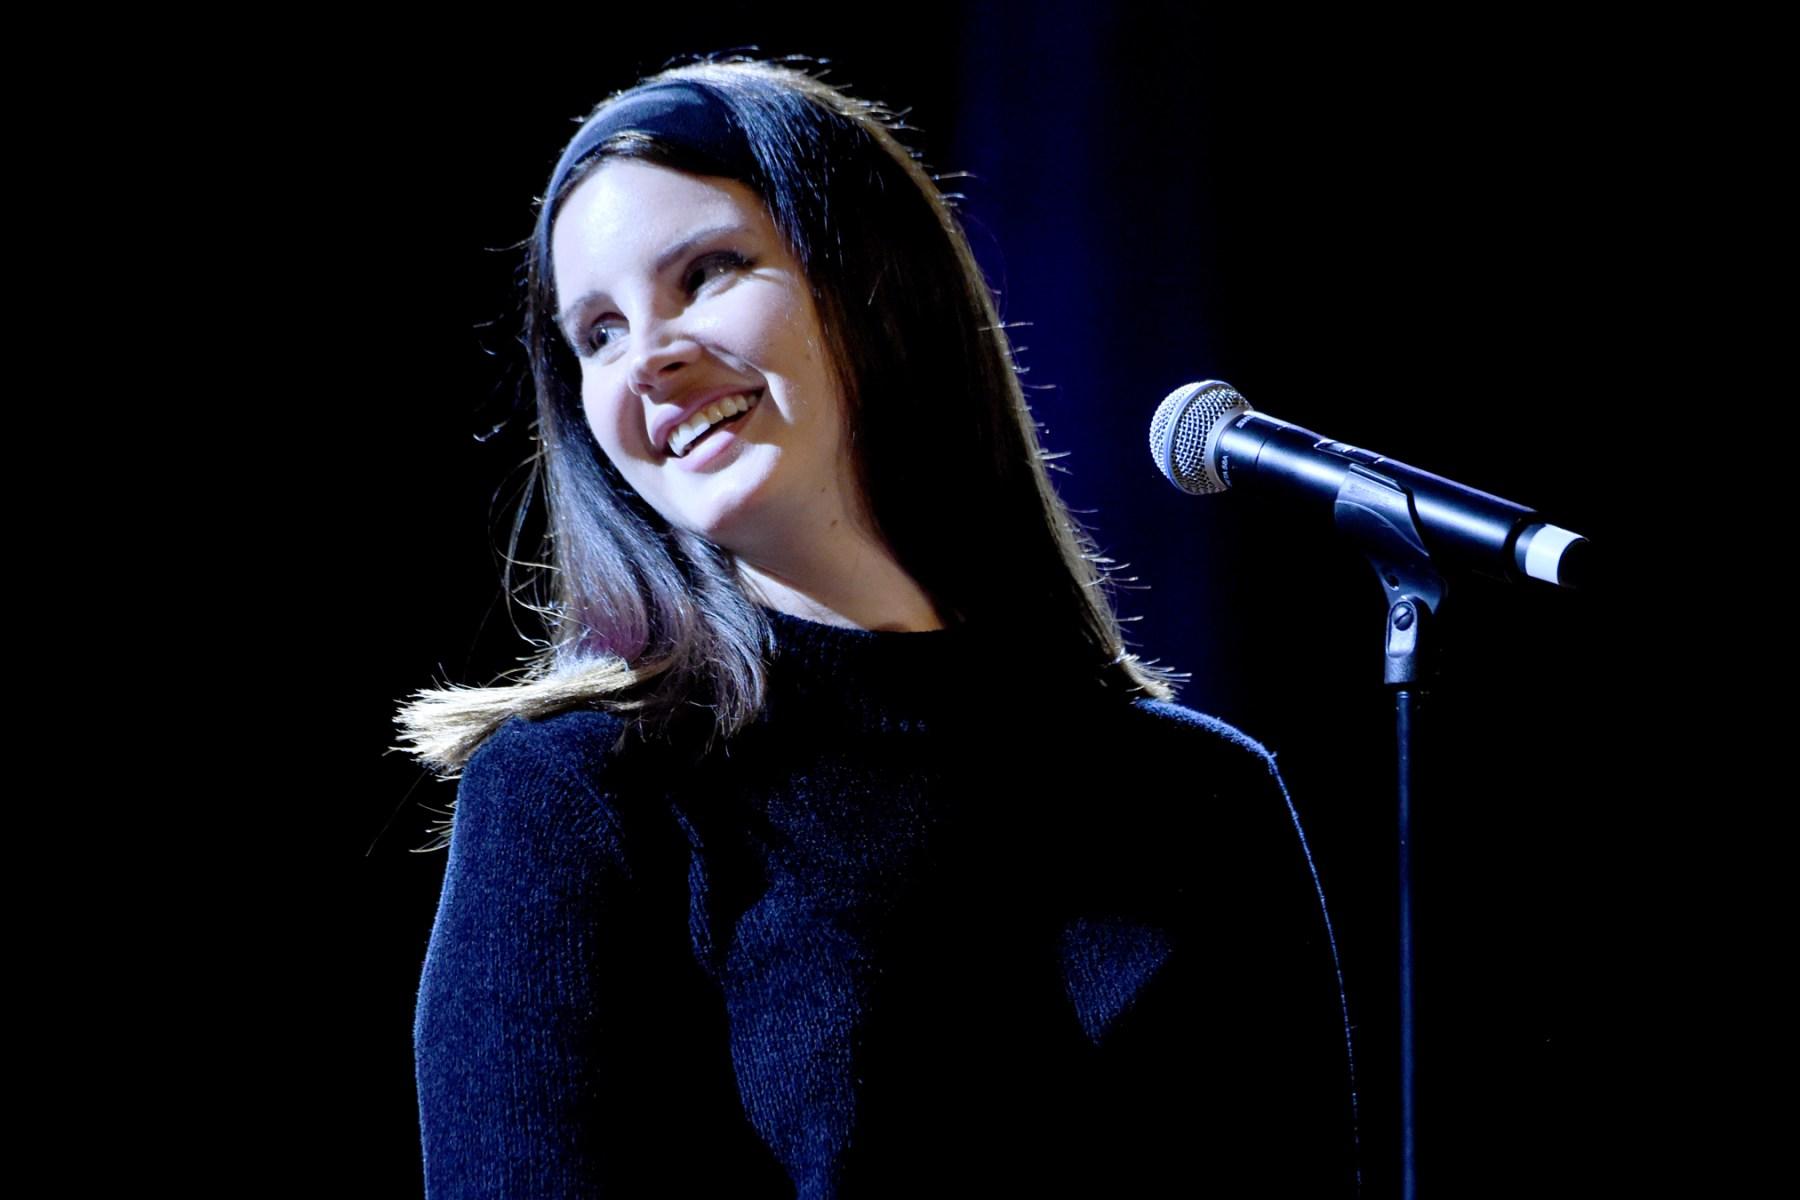 Lana Del Rey Announces New Freestyle Poetry Spoken Word Album Rolling Stone